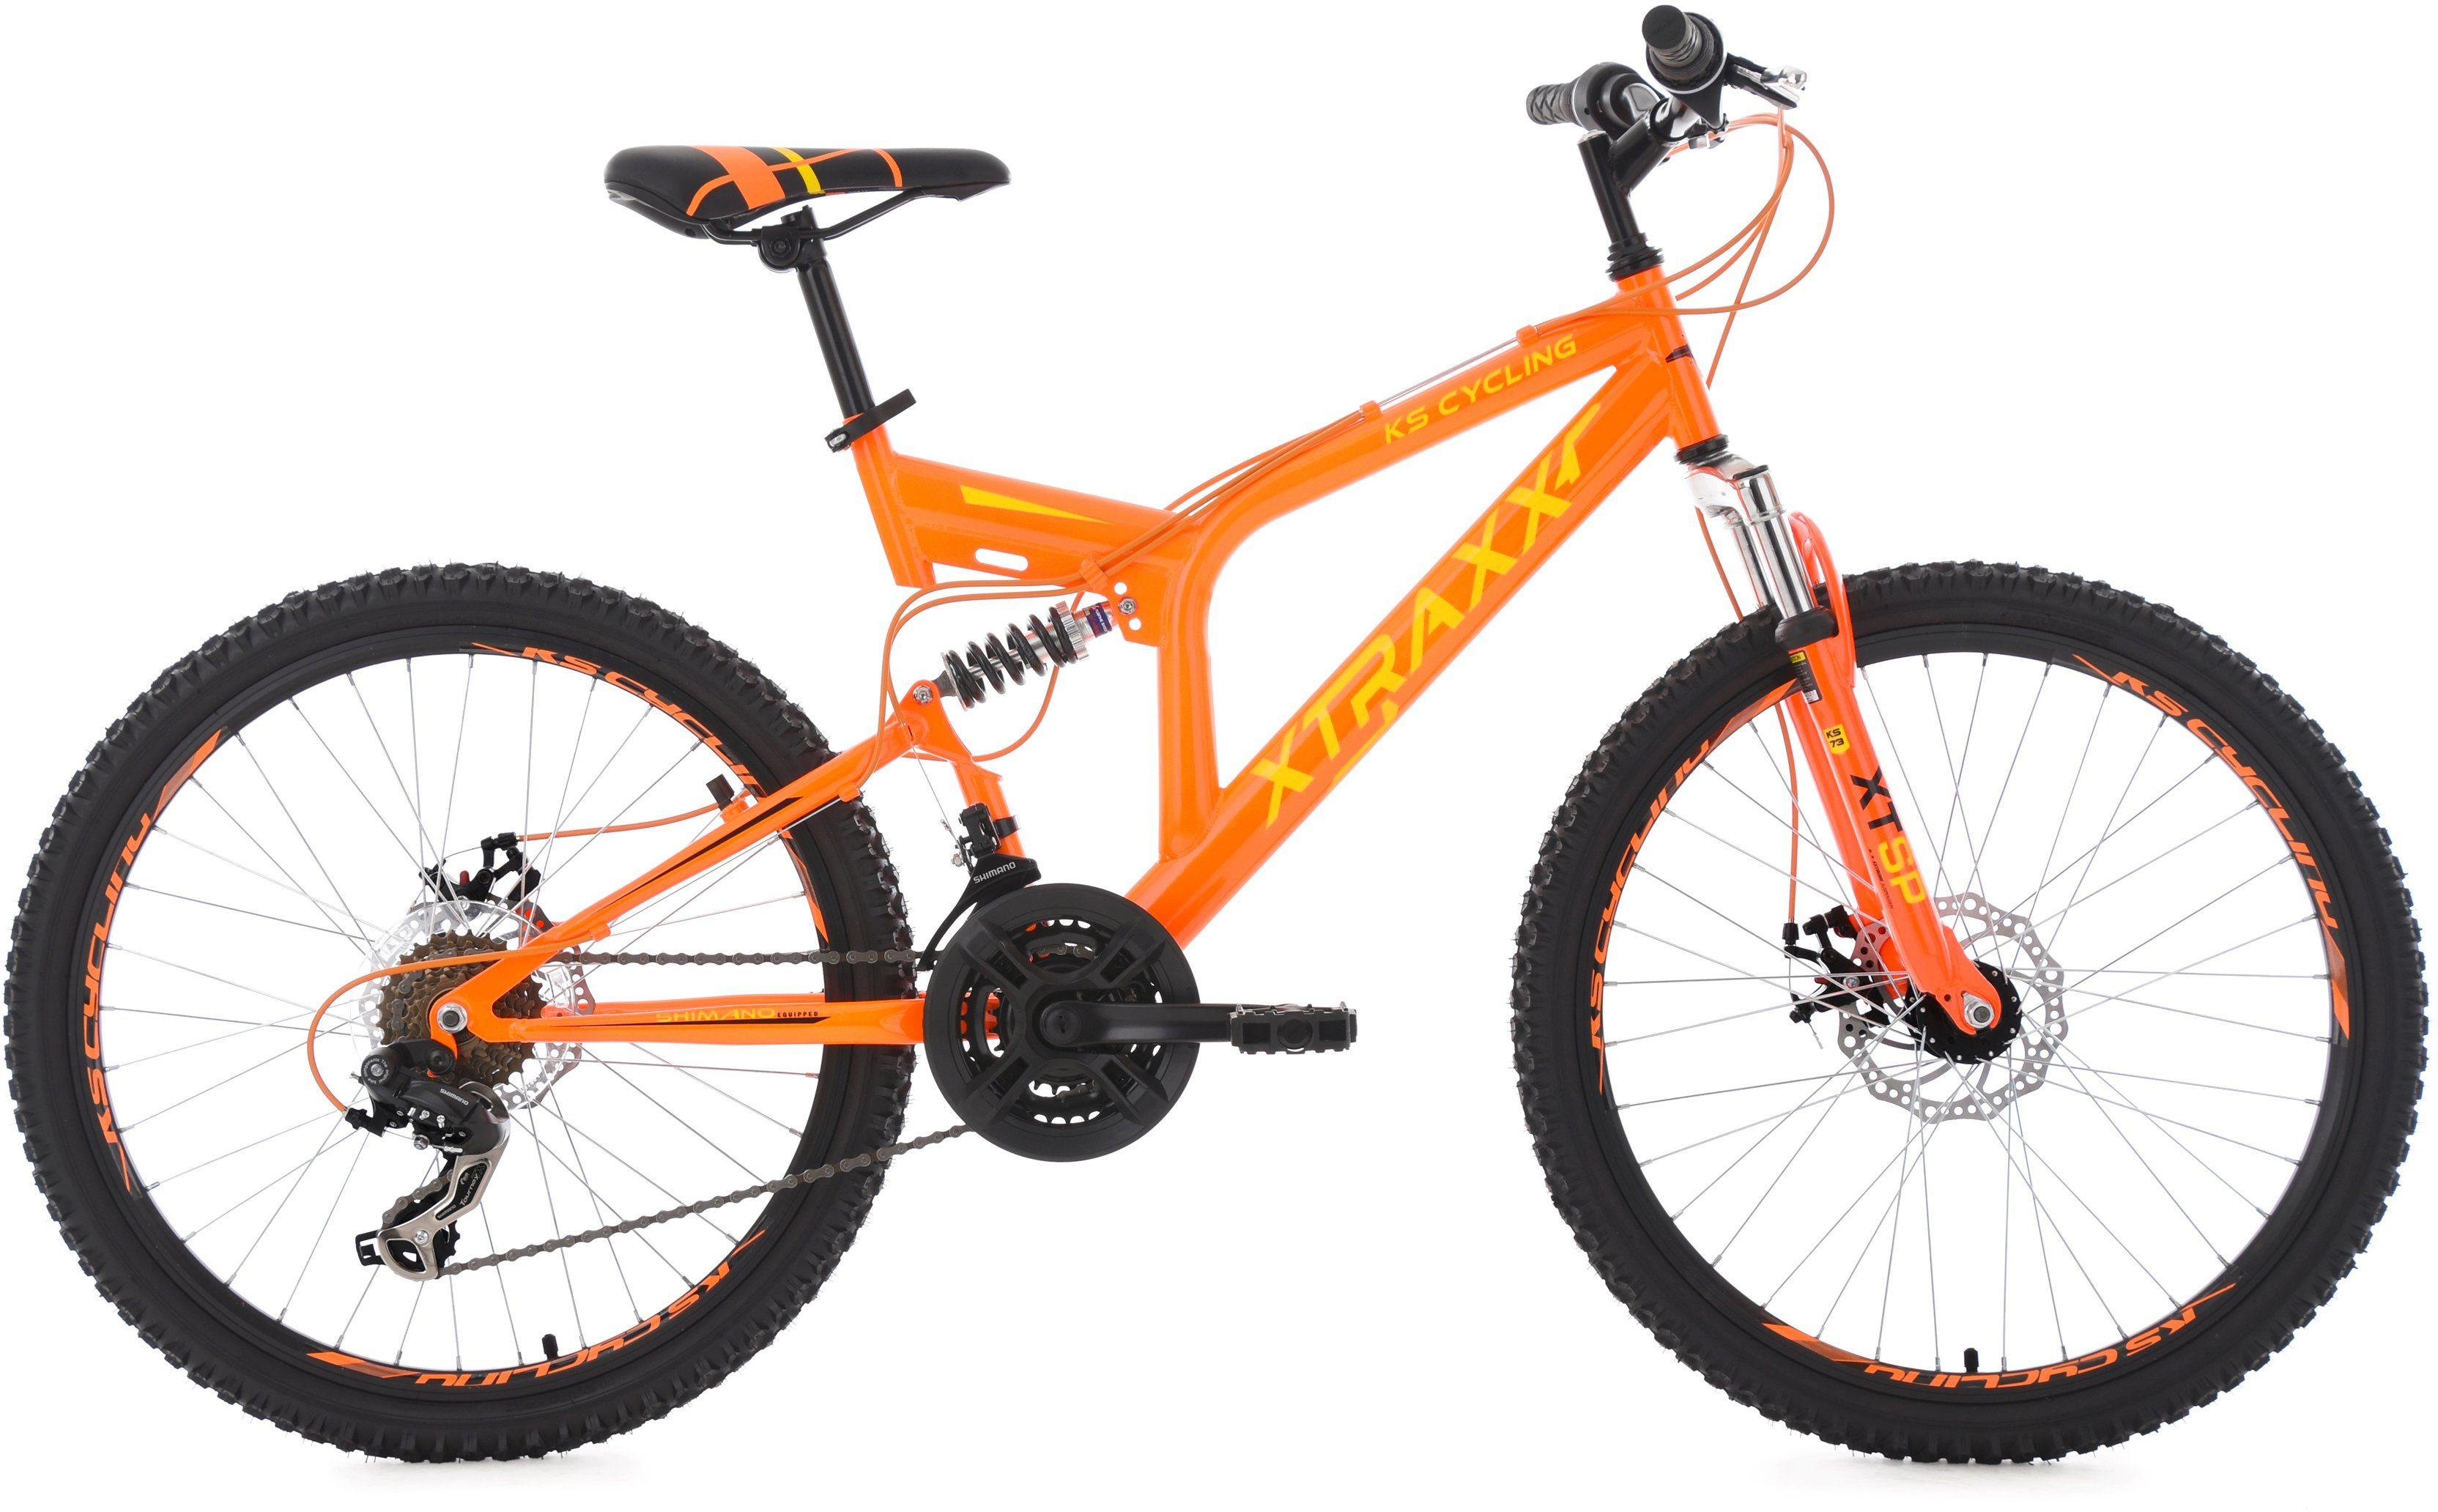 KS Cycling Jugendfahrrad, 24 Zoll, orange-gelb, Shimano 21 Gang-Kettenschaltung, »XTRAXX«